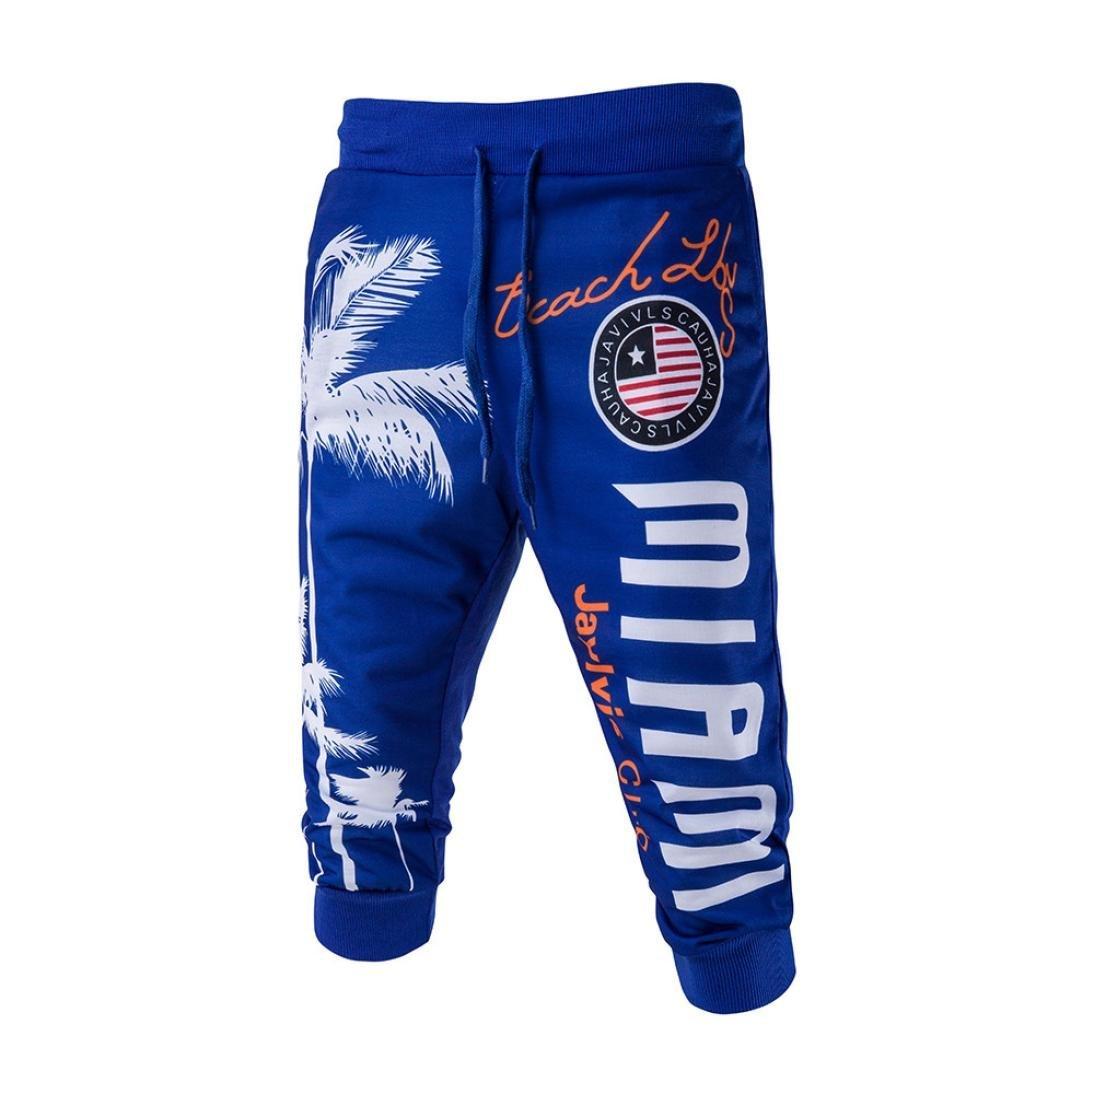 HTHJSCO Men's Hip hop Loose Sweatpants Graffiti Sports Jogger Trousers, Drawstring Elastic Waist Printing Loose Sports Pants (Blue, M)